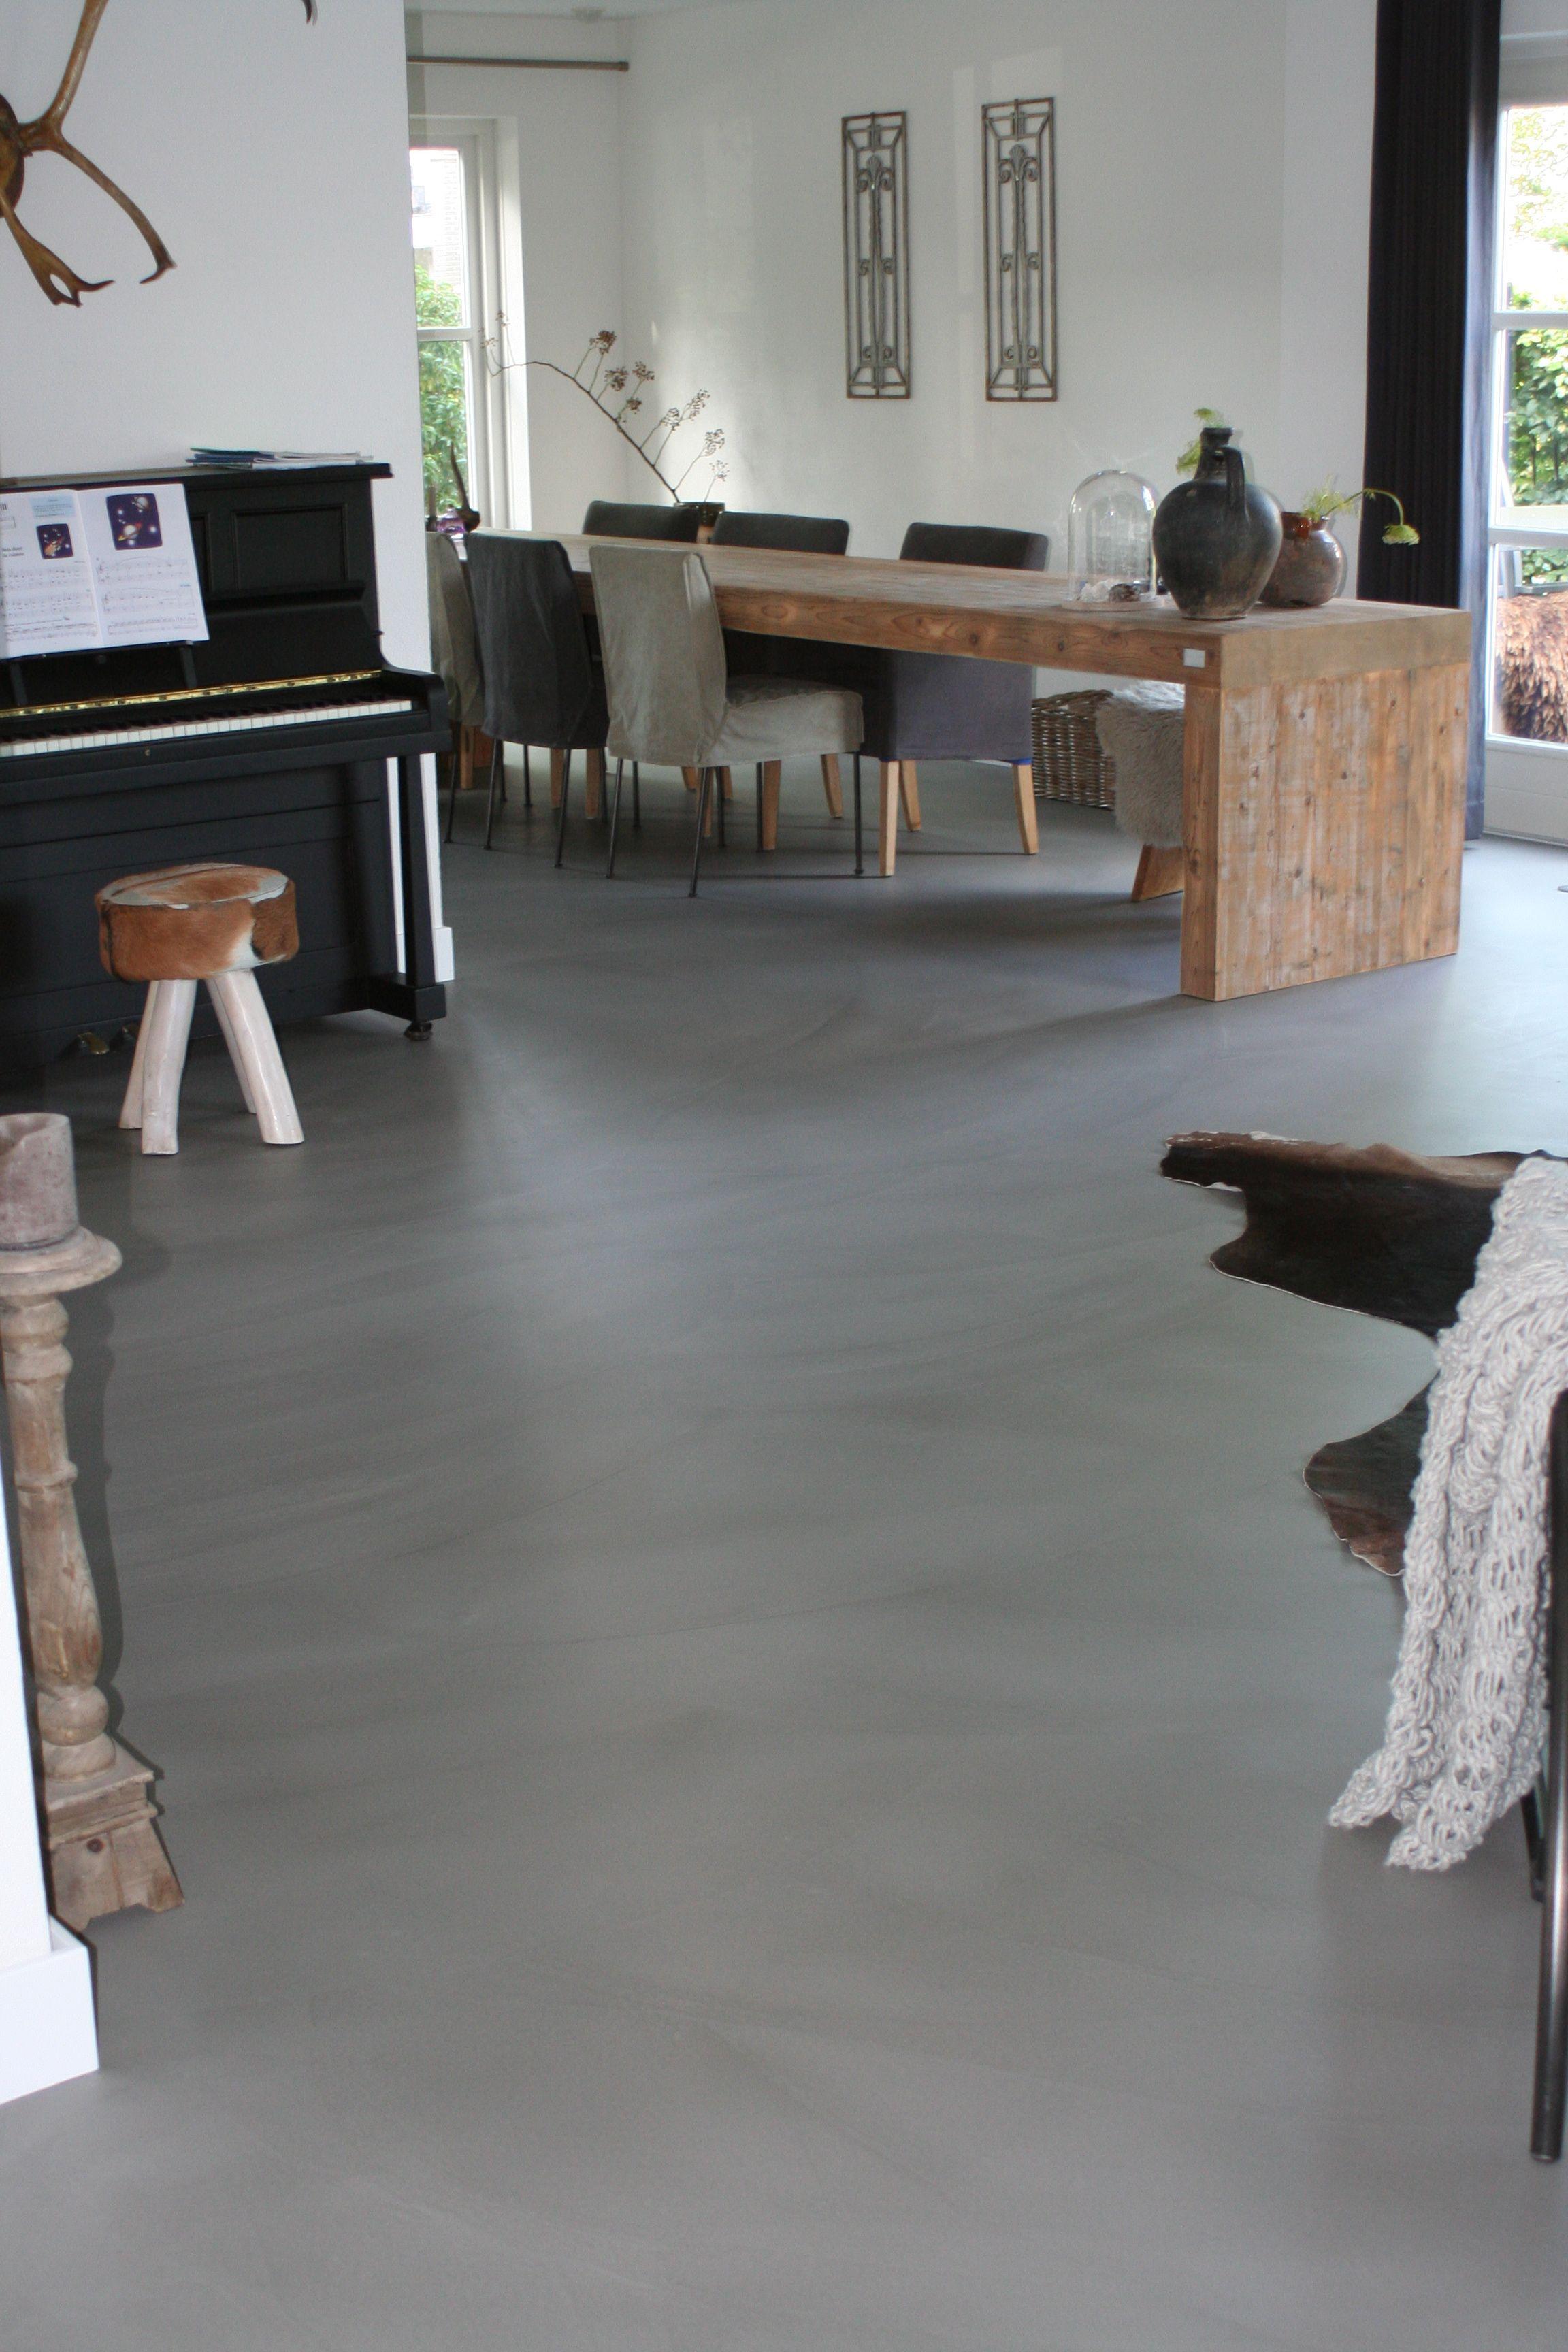 Estrich Bodenbelag vloer en zo pandomo floor ral 7039 project limmen estrich